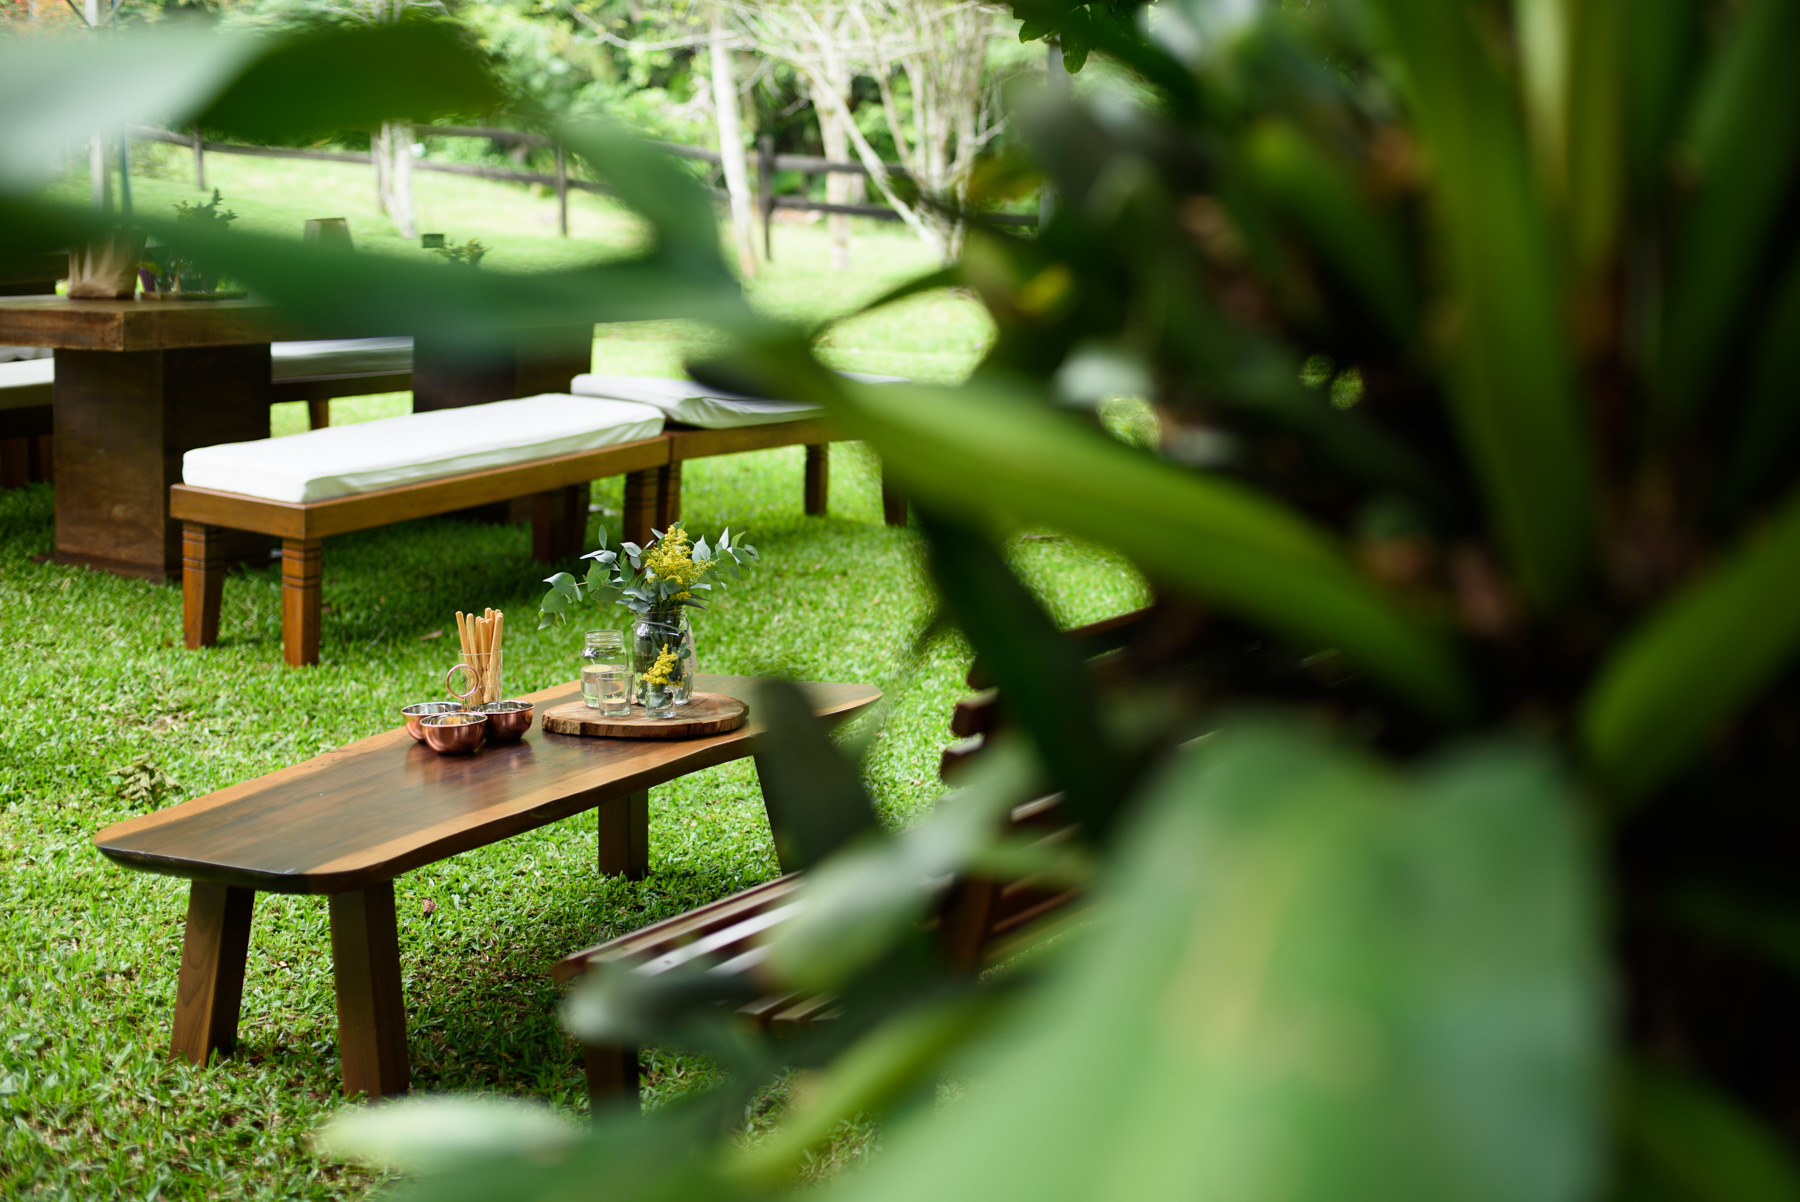 007_aniversario_infantil_blumenau_sc_festa_fazenda_homemade_3anos_mark.jpg